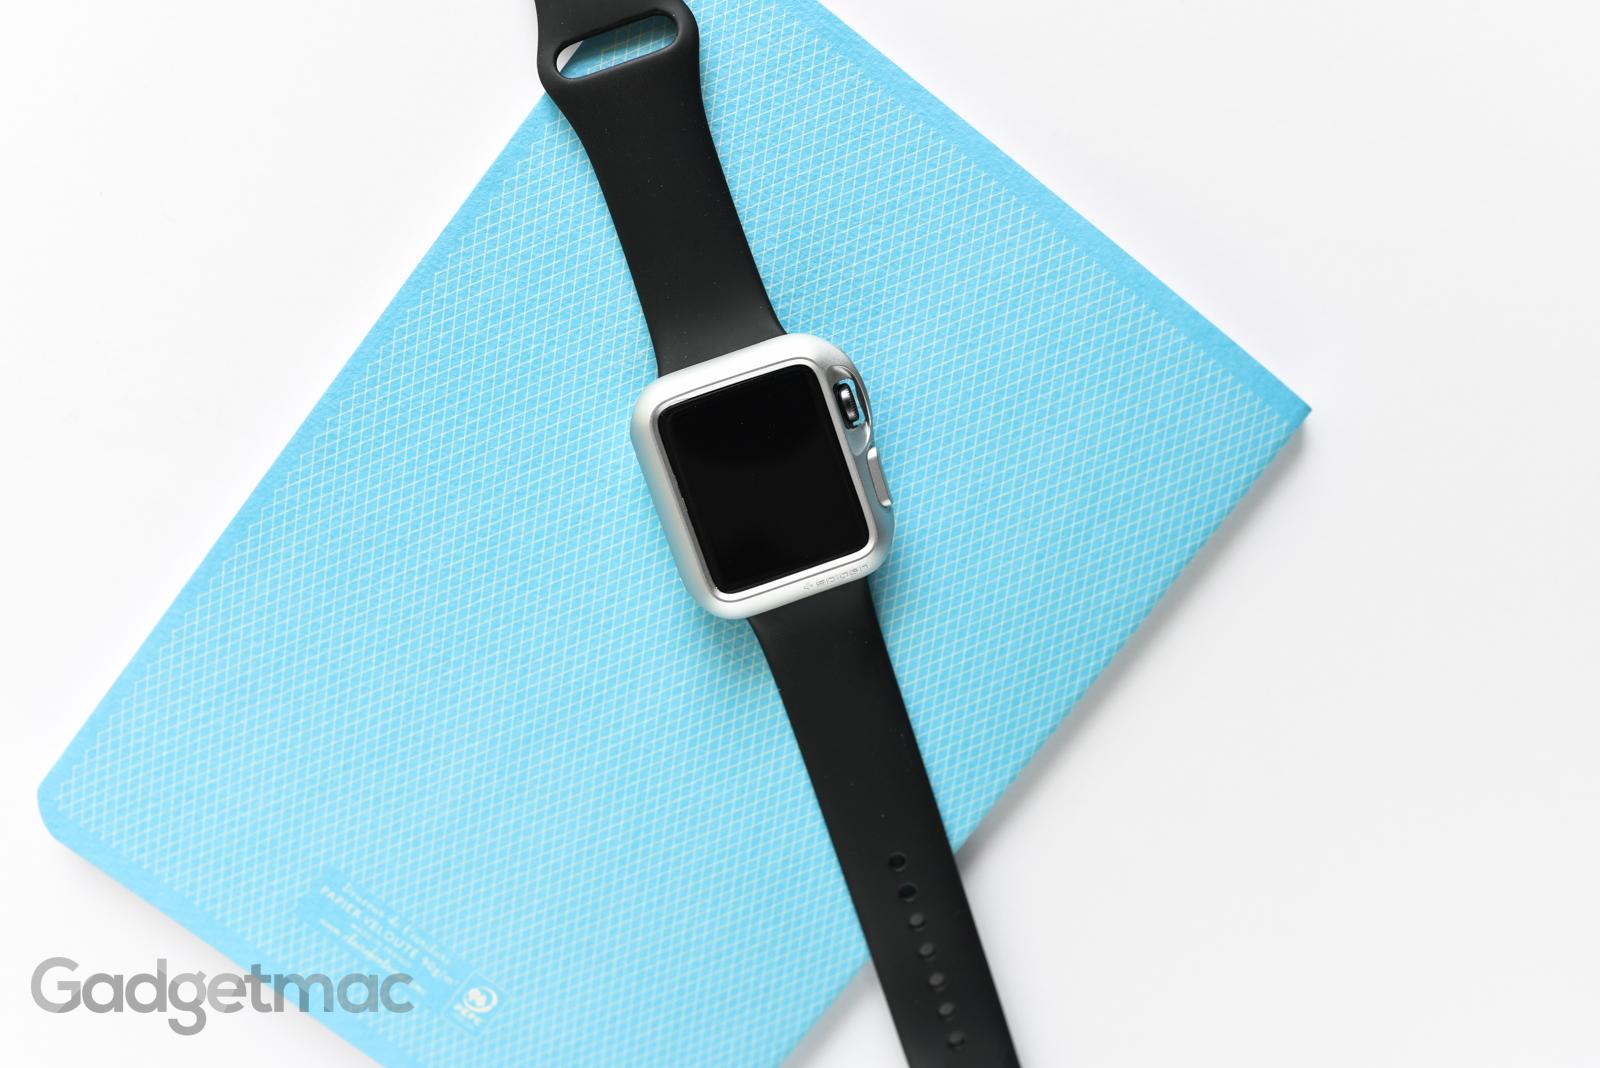 spigen-slim-armor-silver-case-for-apple-watch-top-view.jpg